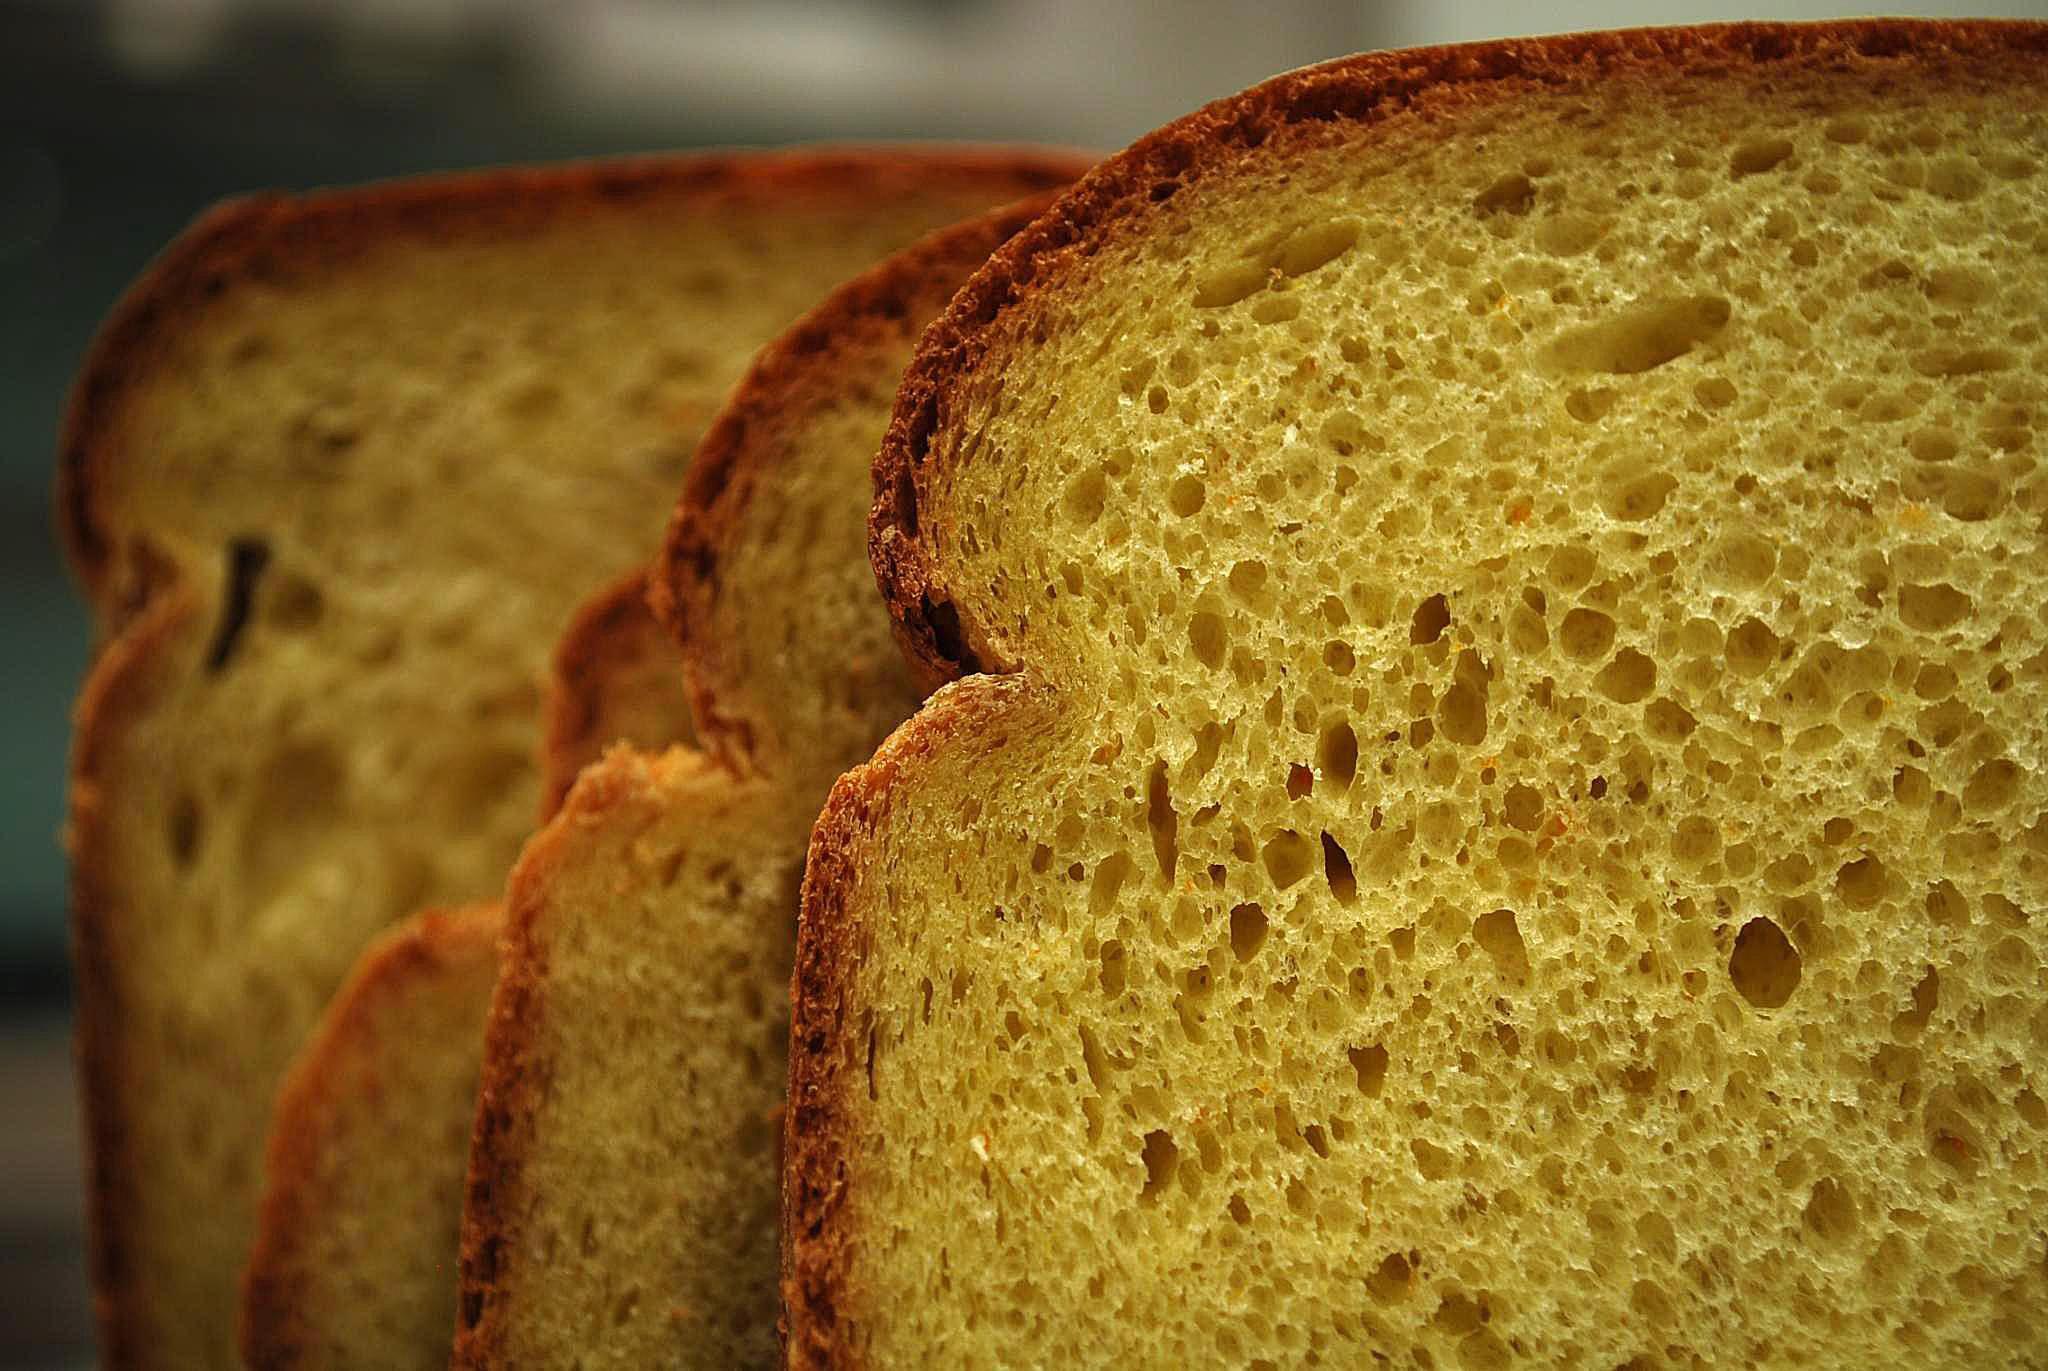 картинки жидкий хлеб как